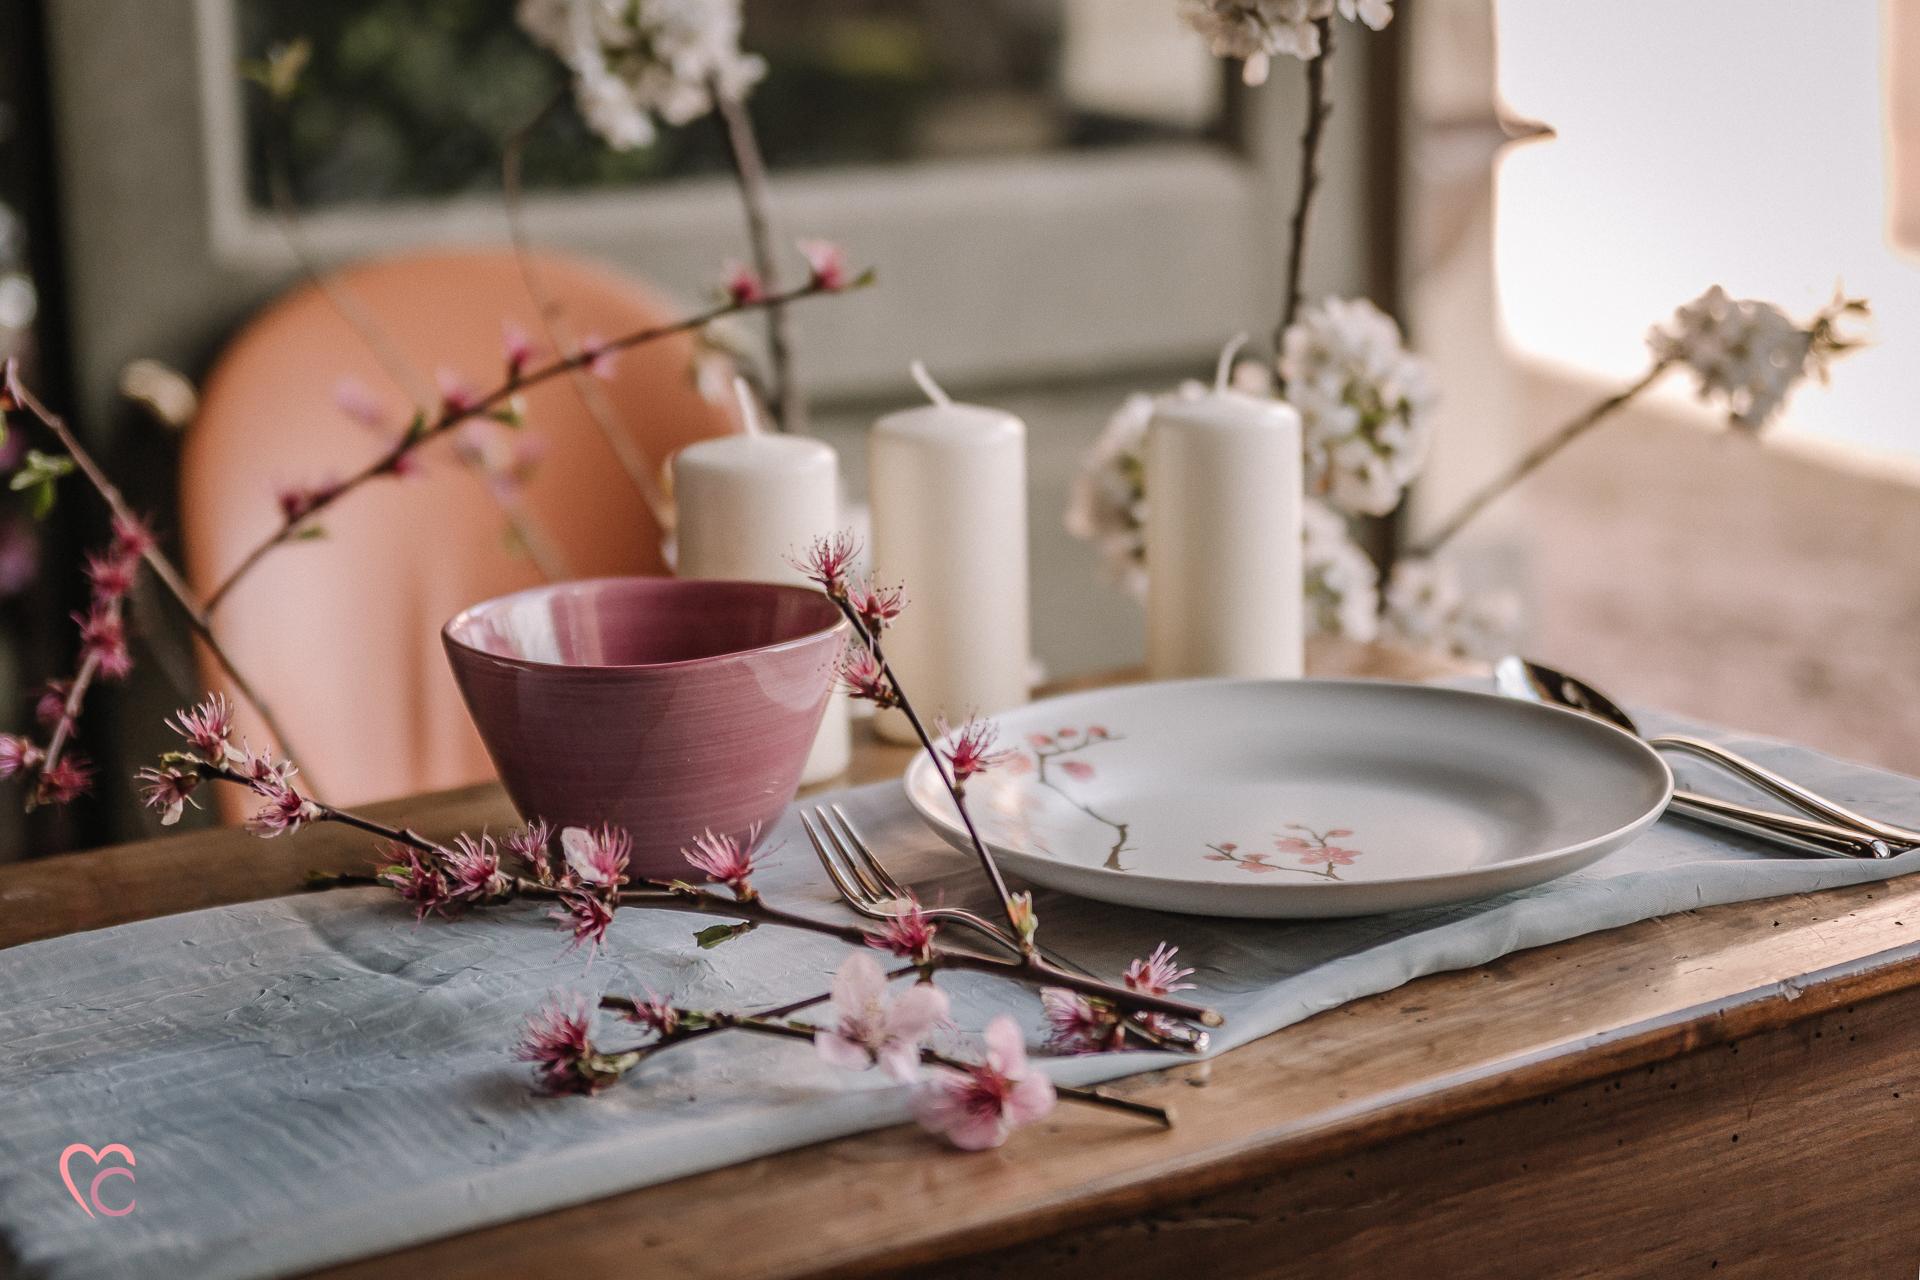 cherry blossom inspirations,hanami, ispirazione giappone,posto tavola